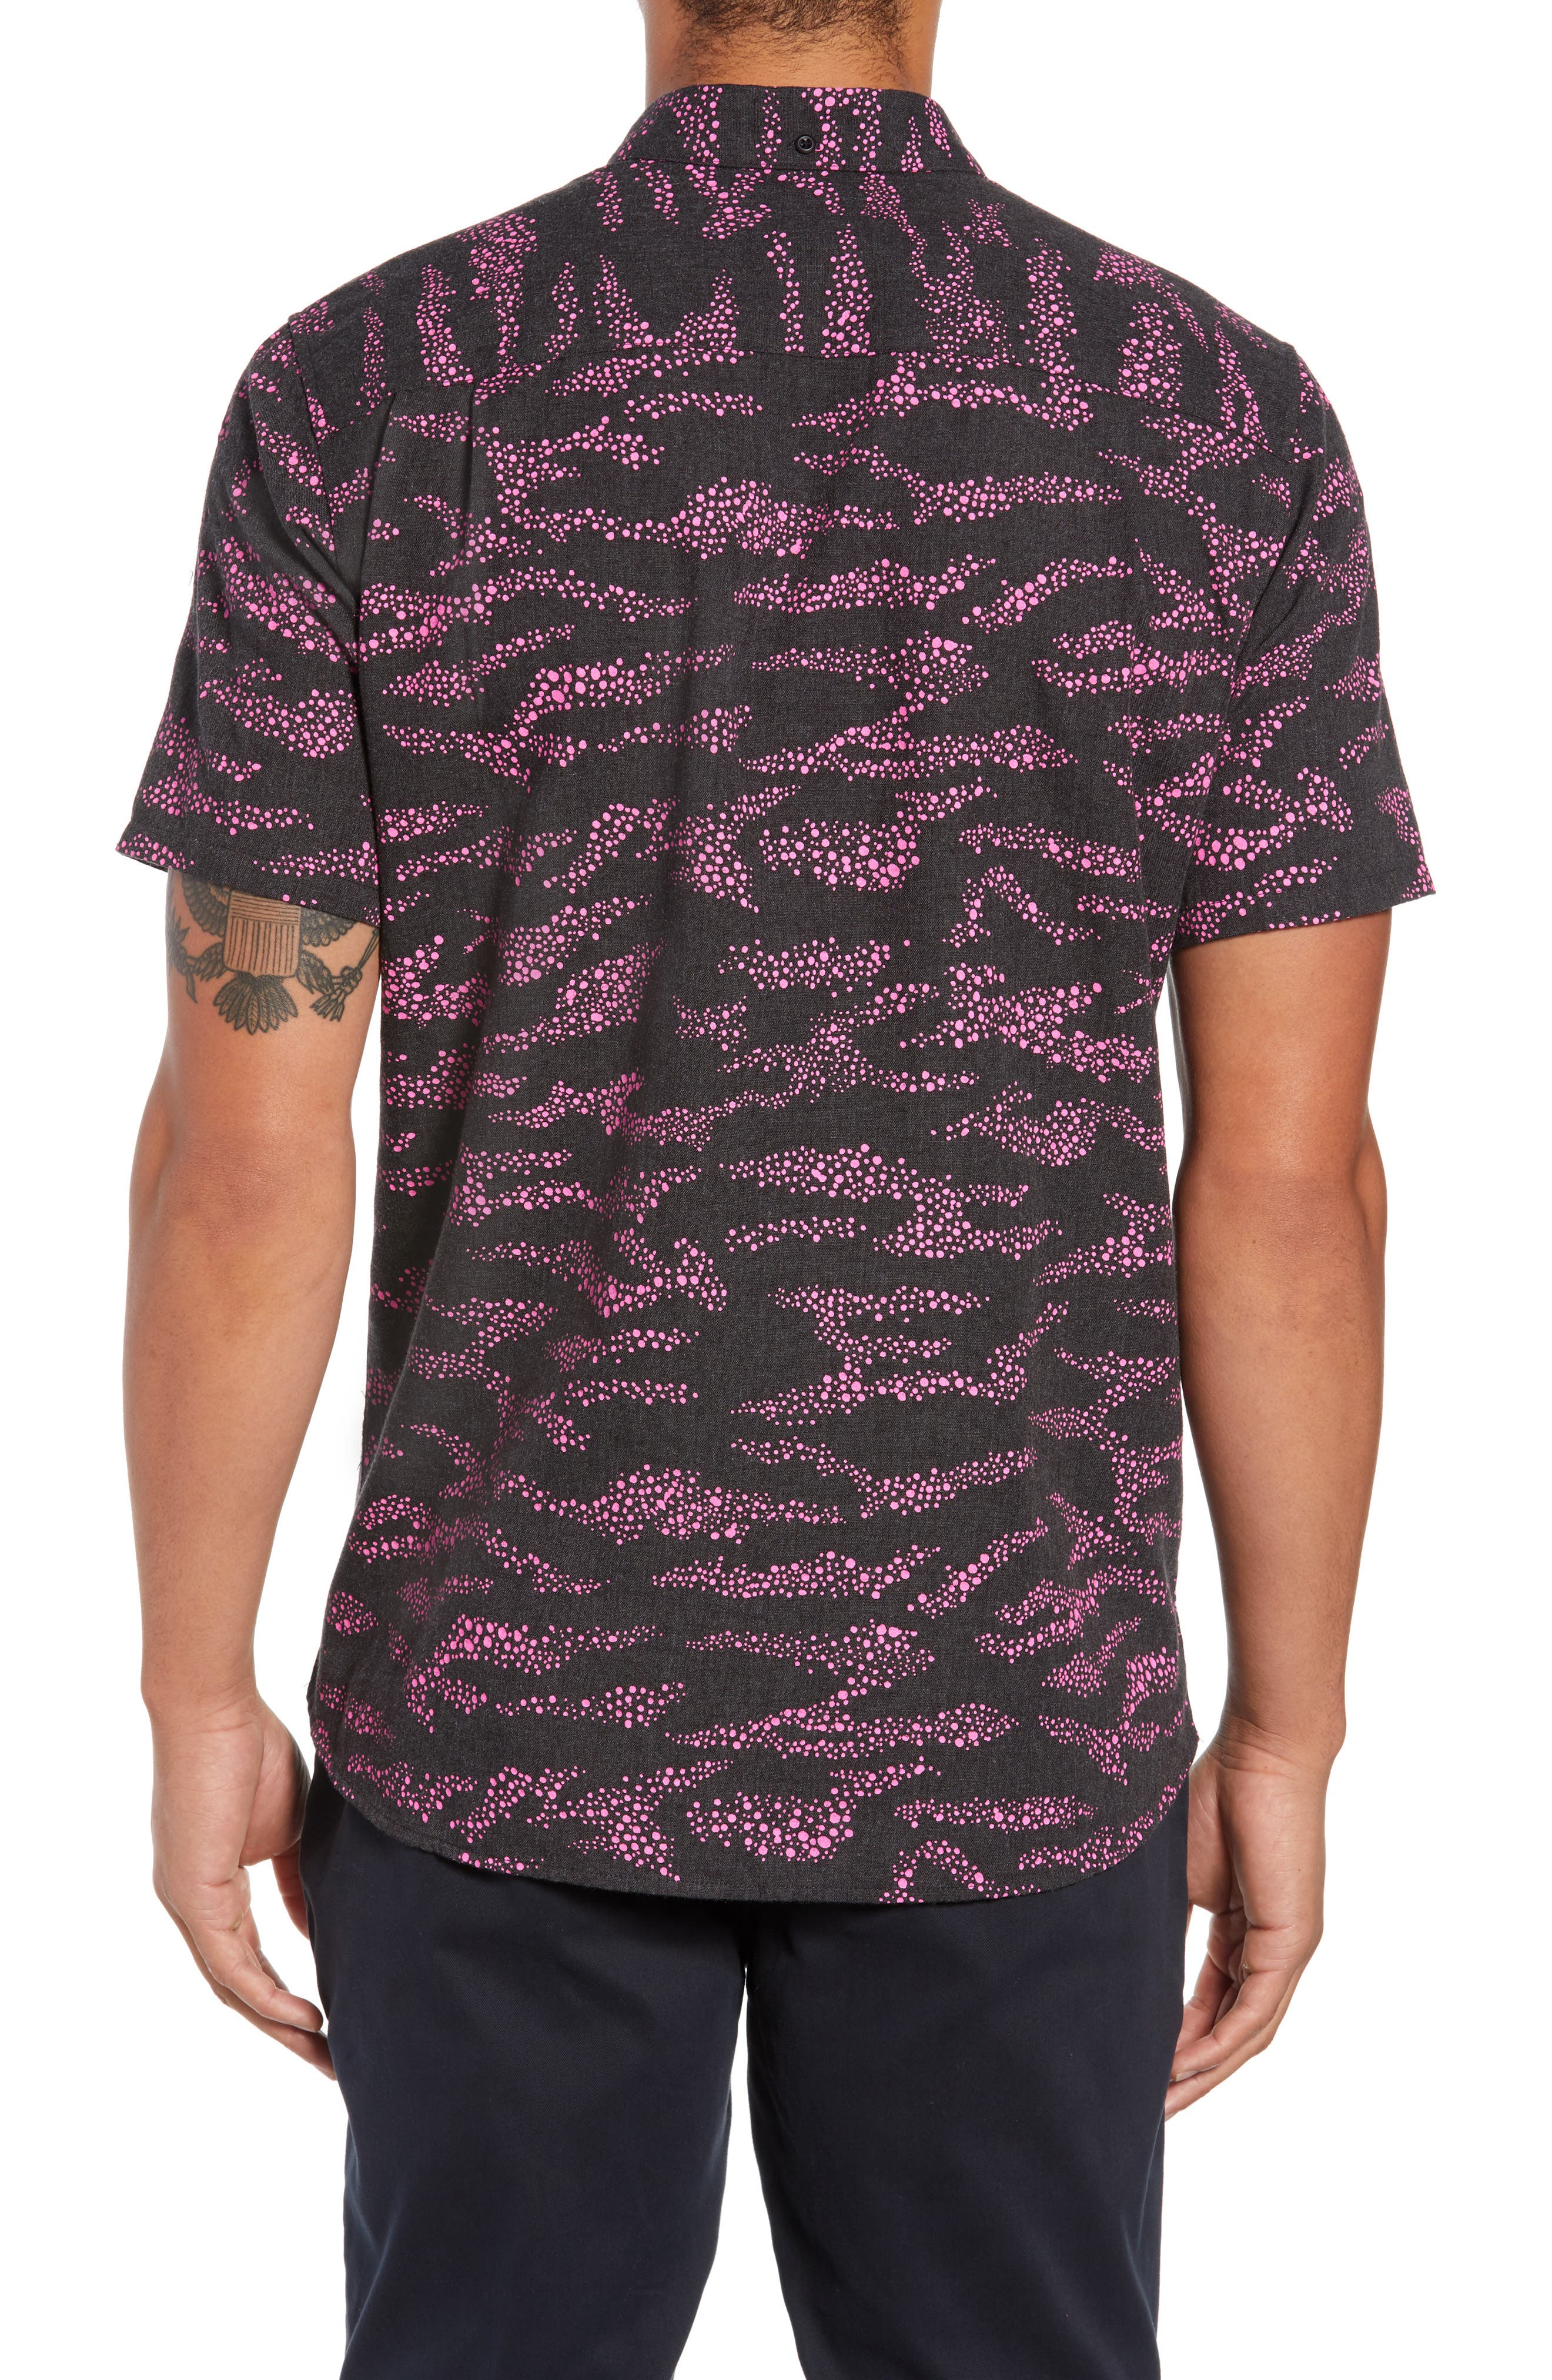 Outcast Woven Shirt,                             Alternate thumbnail 3, color,                             BLACK HEATHER